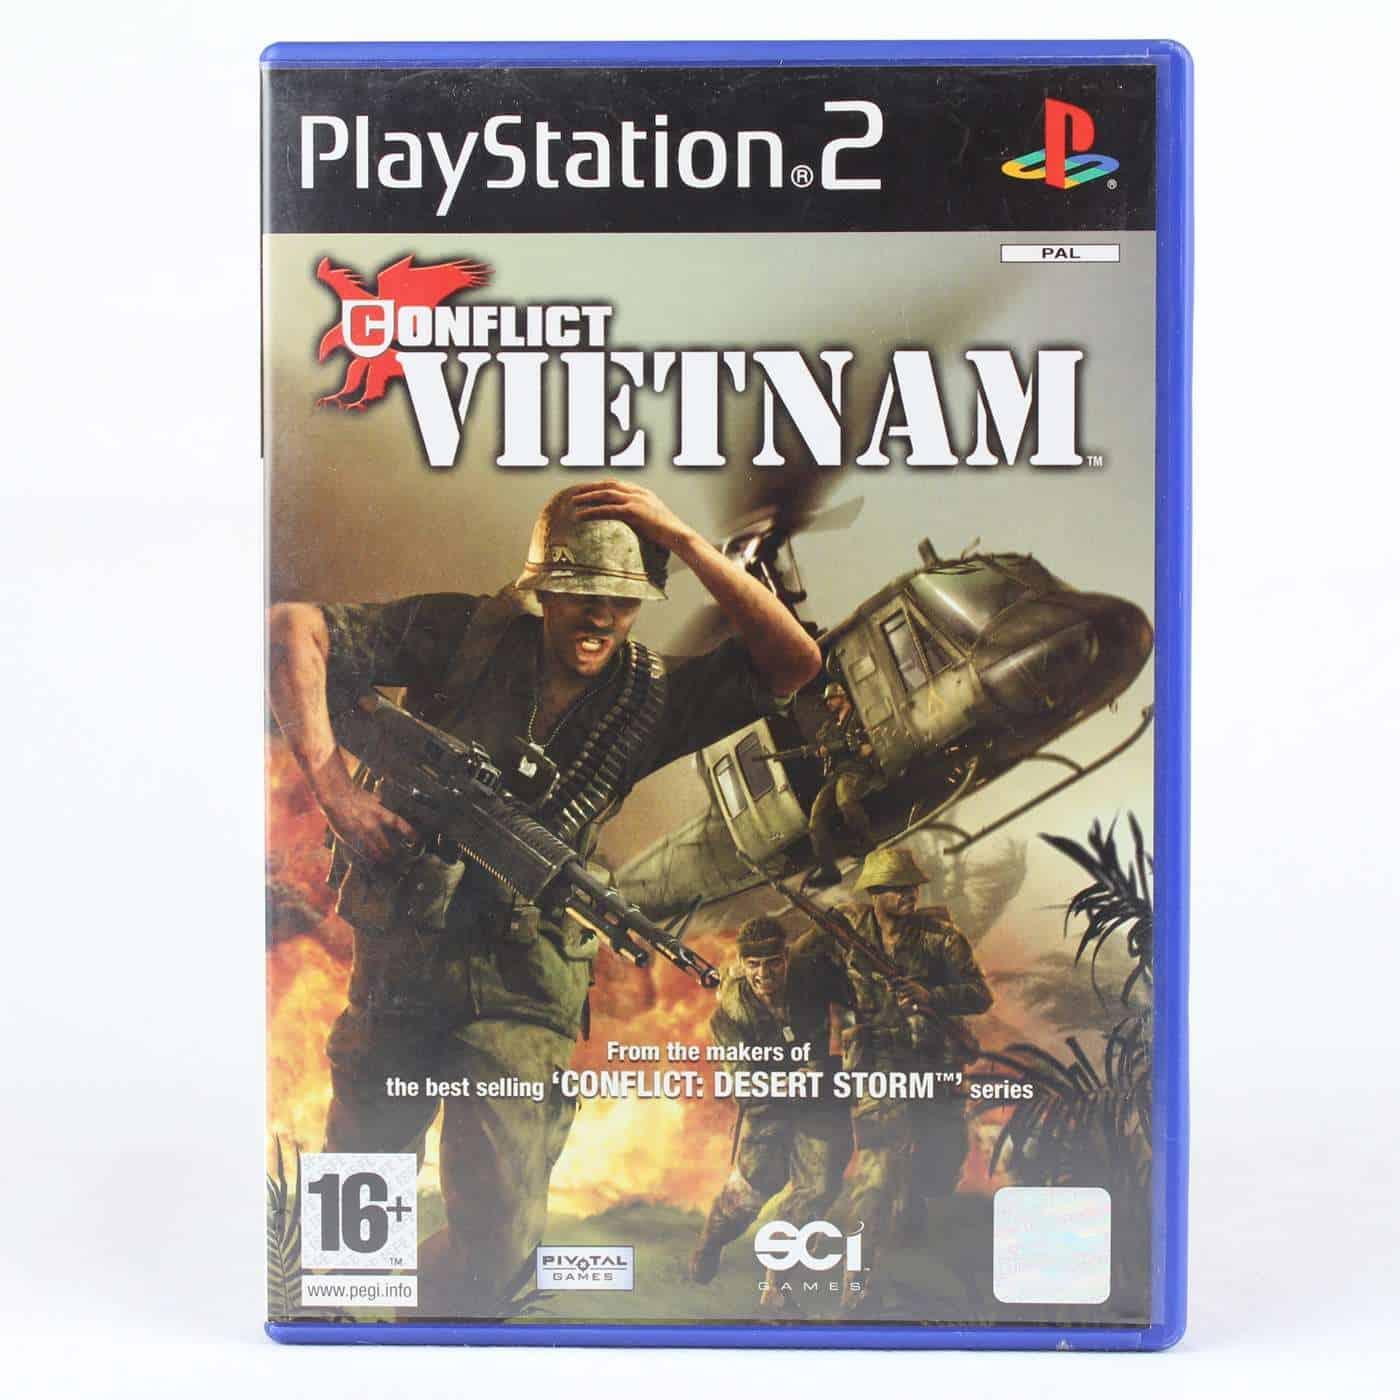 Conflict: Vietnam (Playstation 2)